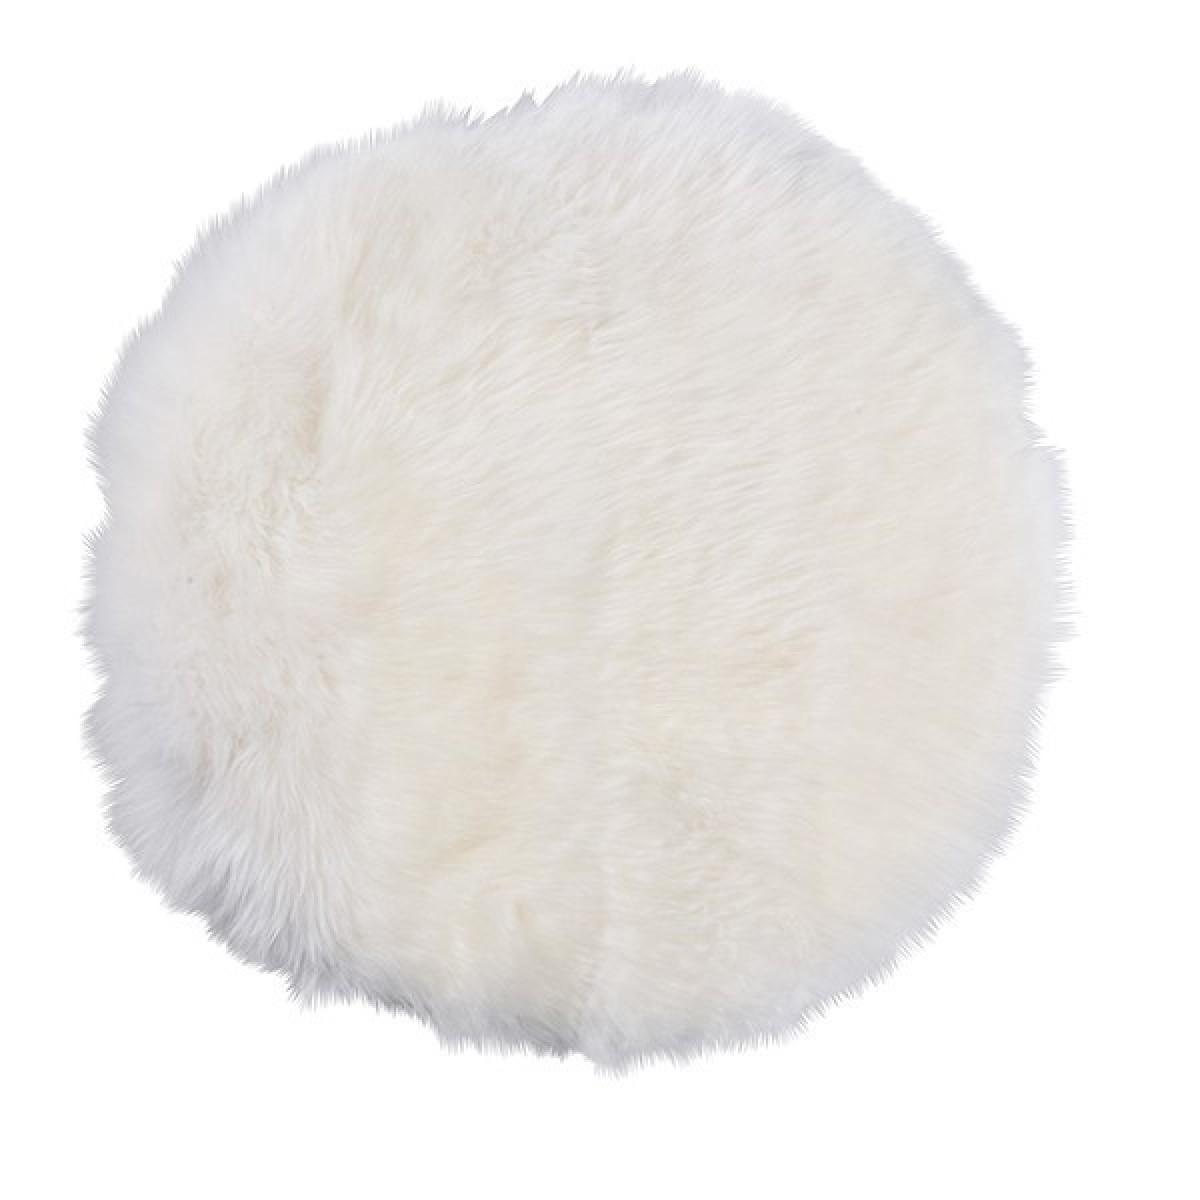 DACORE Sædehynde imiteret lammeskind rund hvid 37 cm.